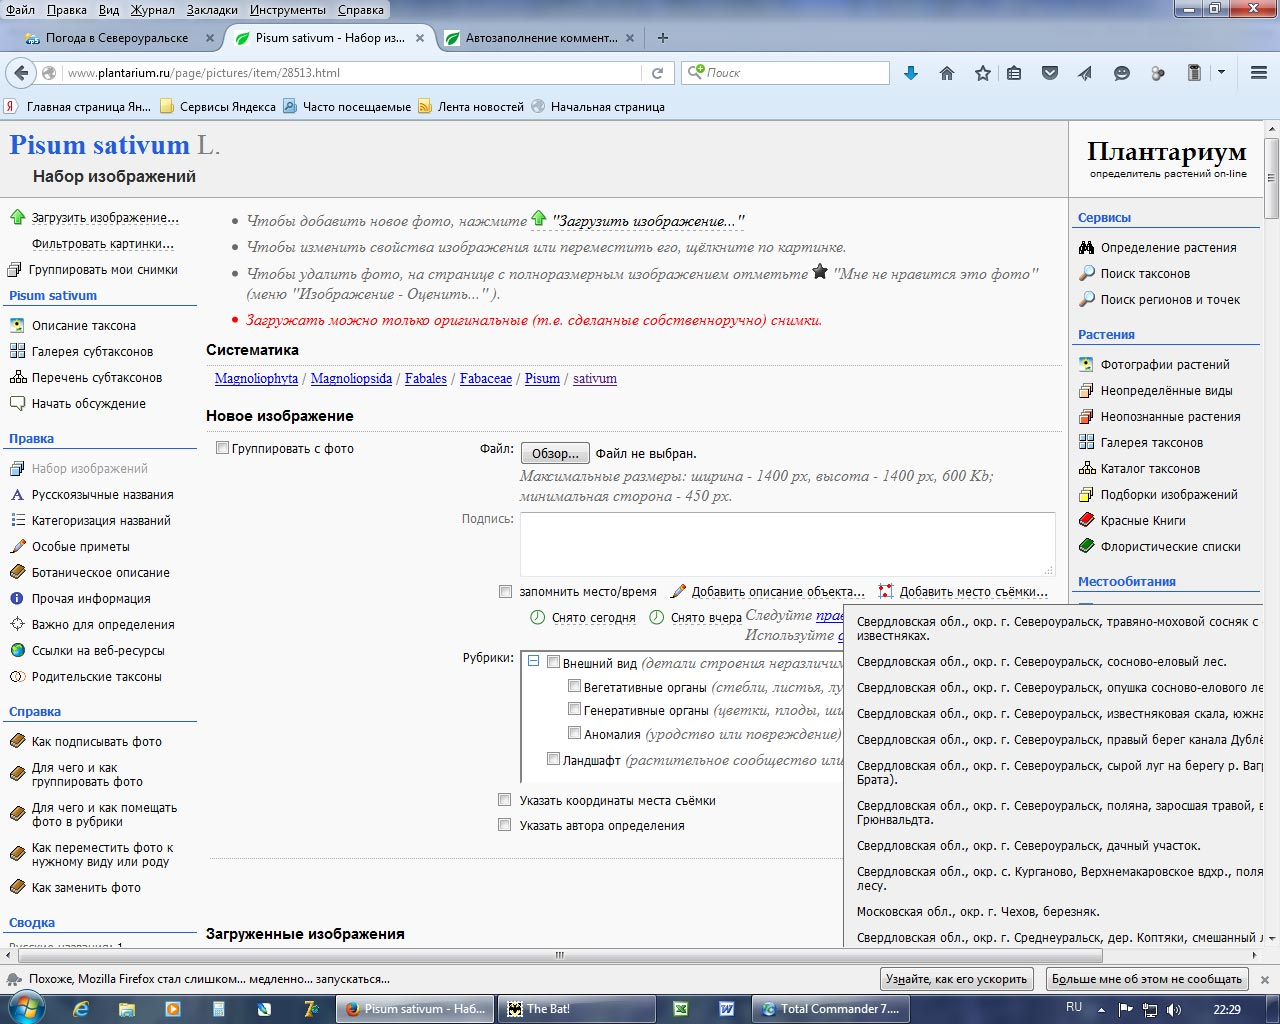 http://forum.plantarium.ru/misc.php?action=pun_attachment&item=8349&download=0